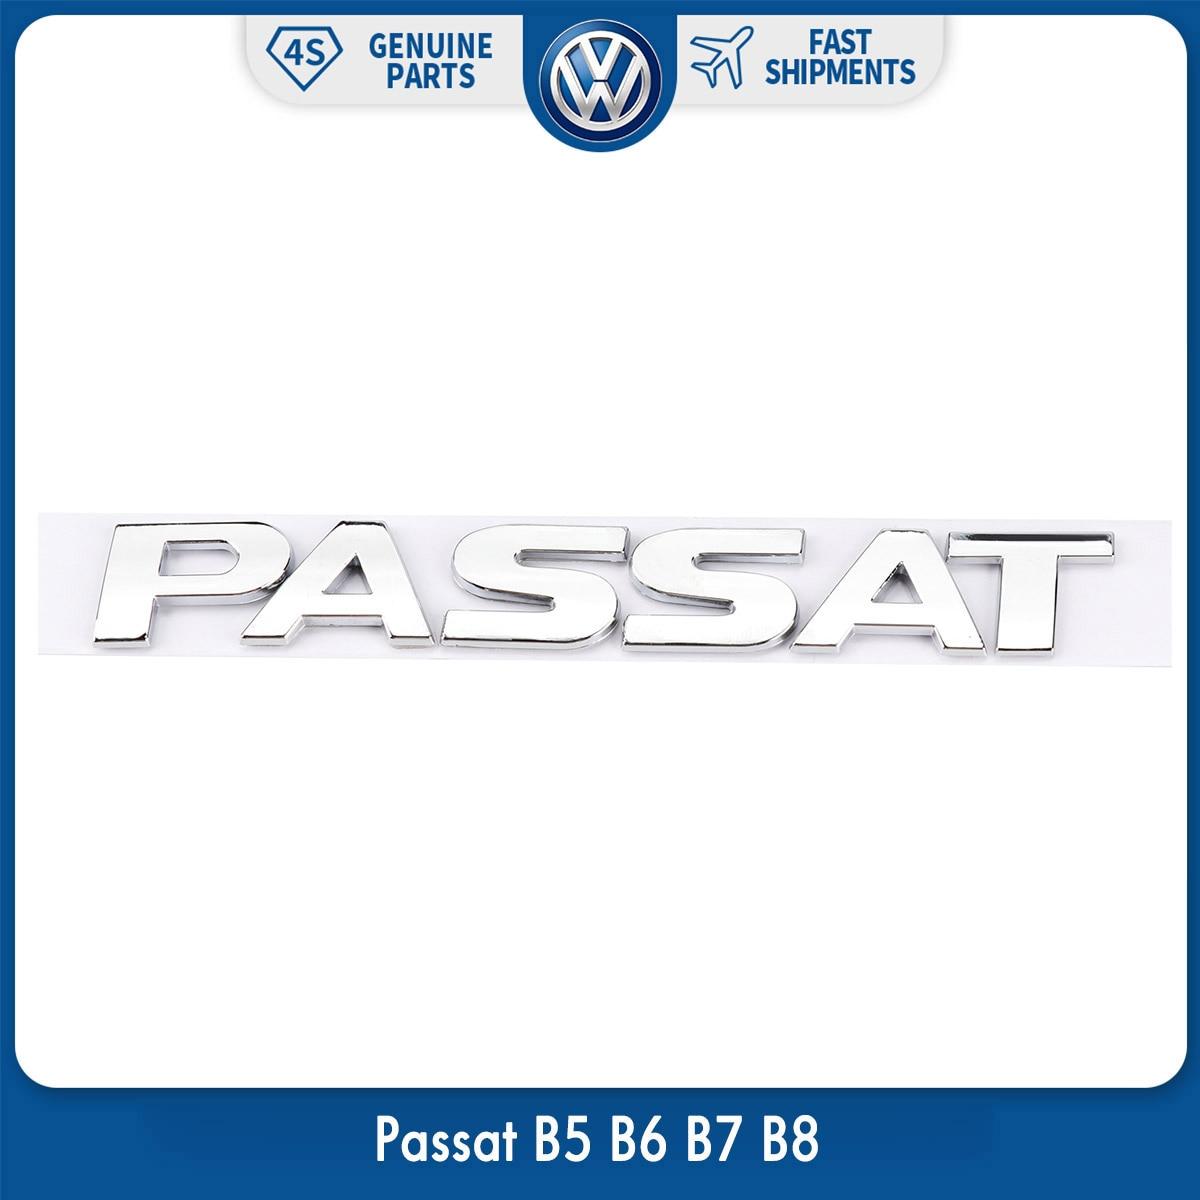 OEM Original Rear Trunk Lid Chrome Silver Emblem Sticker Passat for VW Volkswagen Passat B5 B6 B7 B8